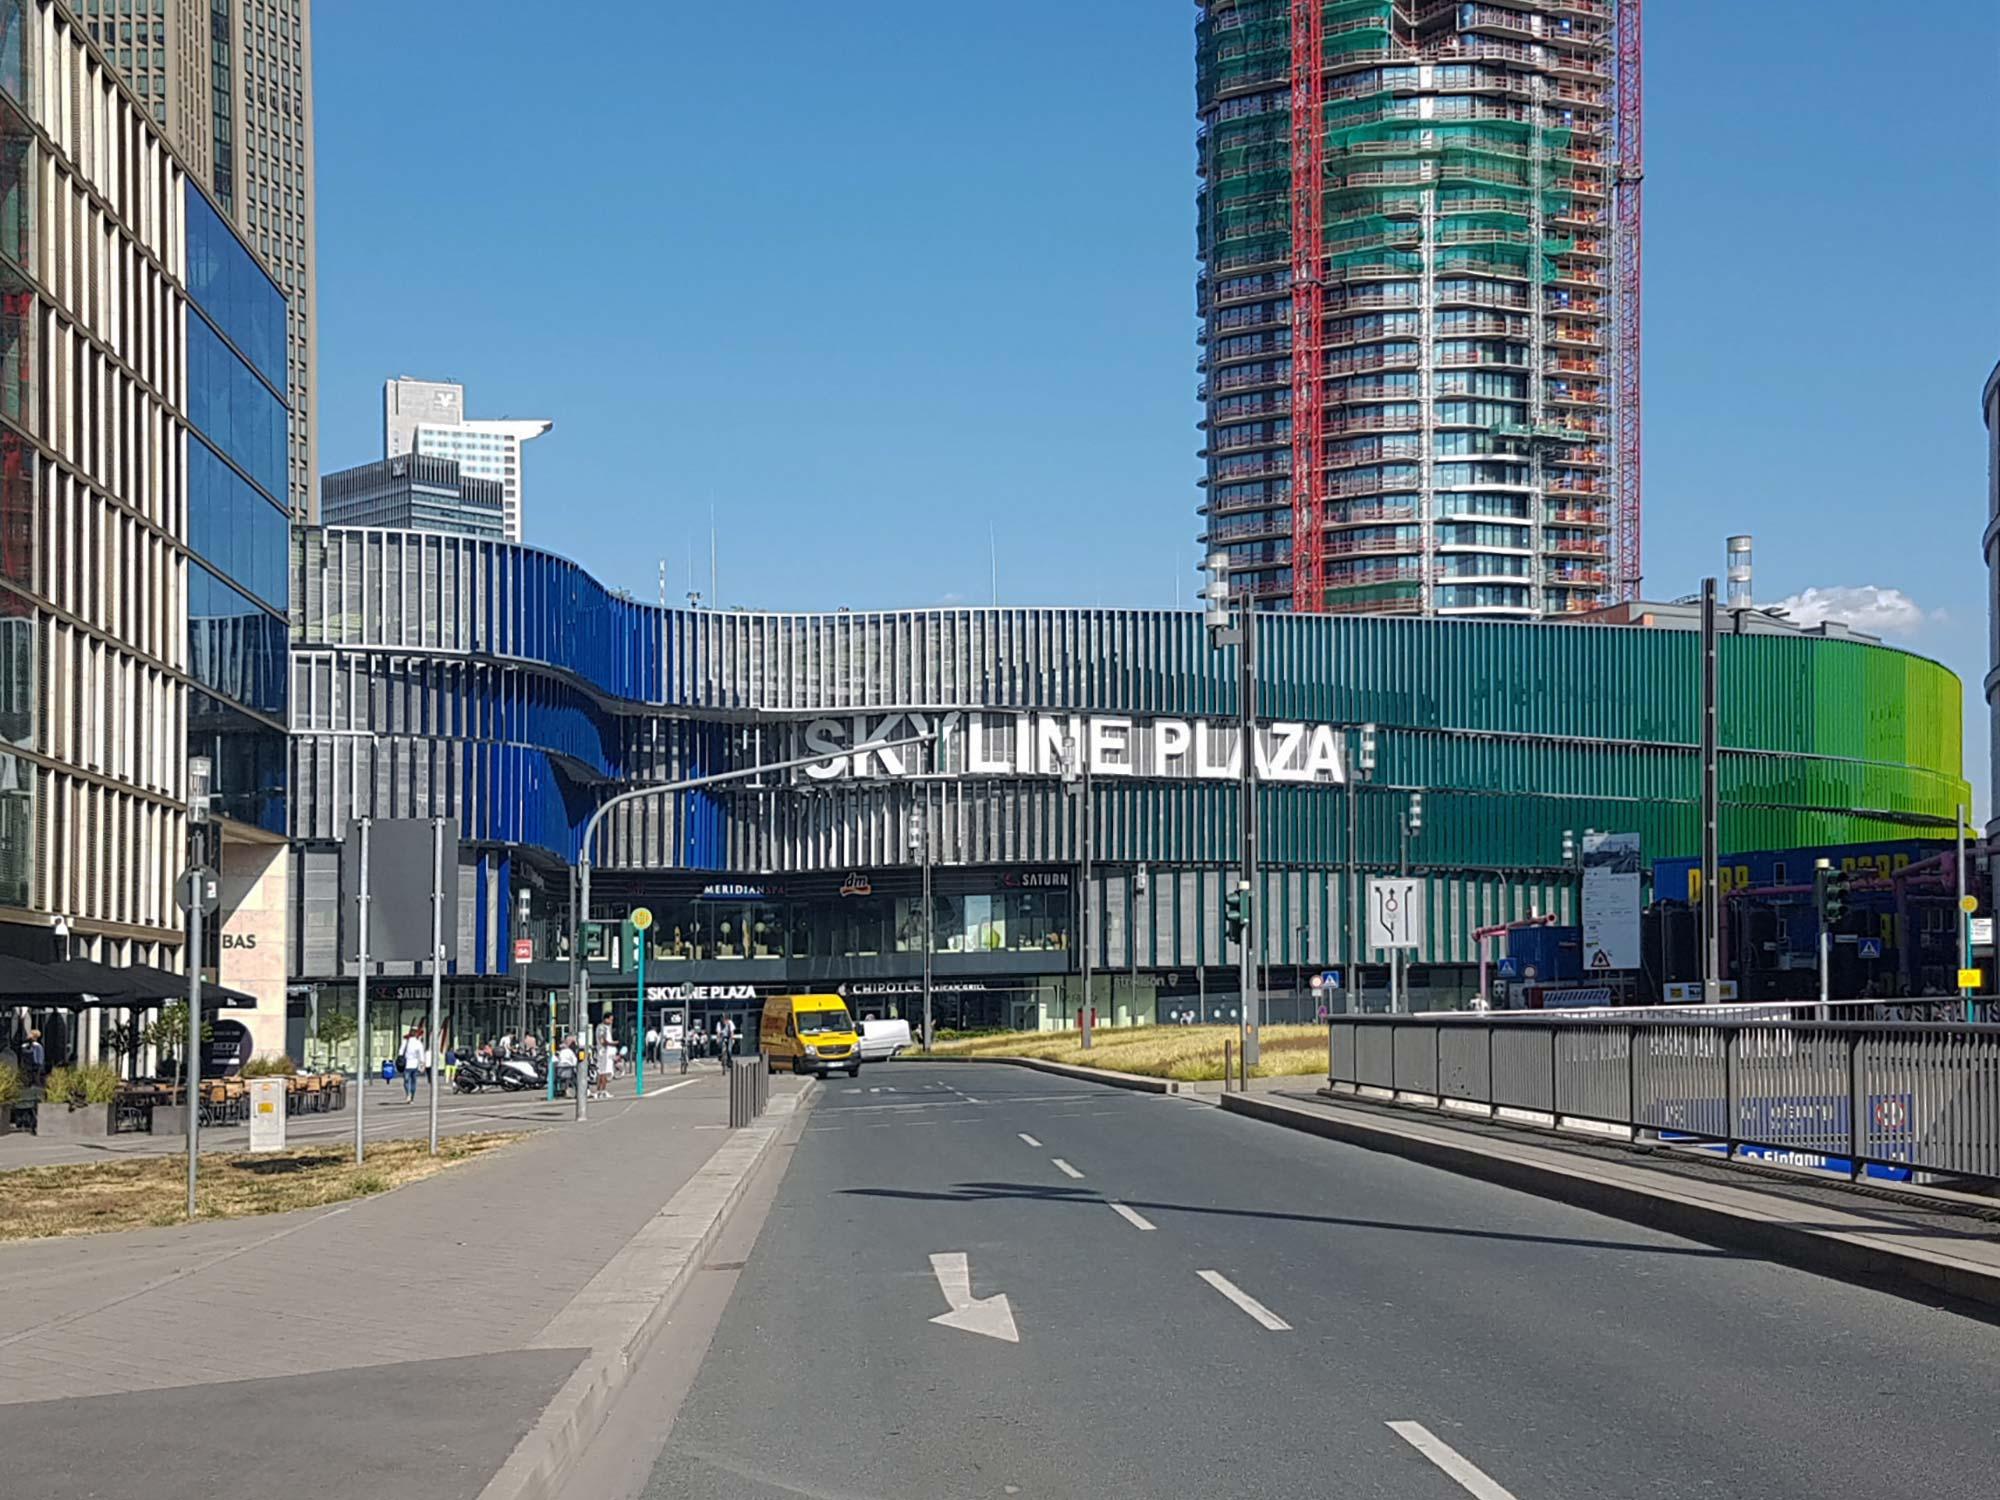 Skylineplaza Frankfurt - Shopping Zentrum FFM - Skyline Plaza - Europaallee